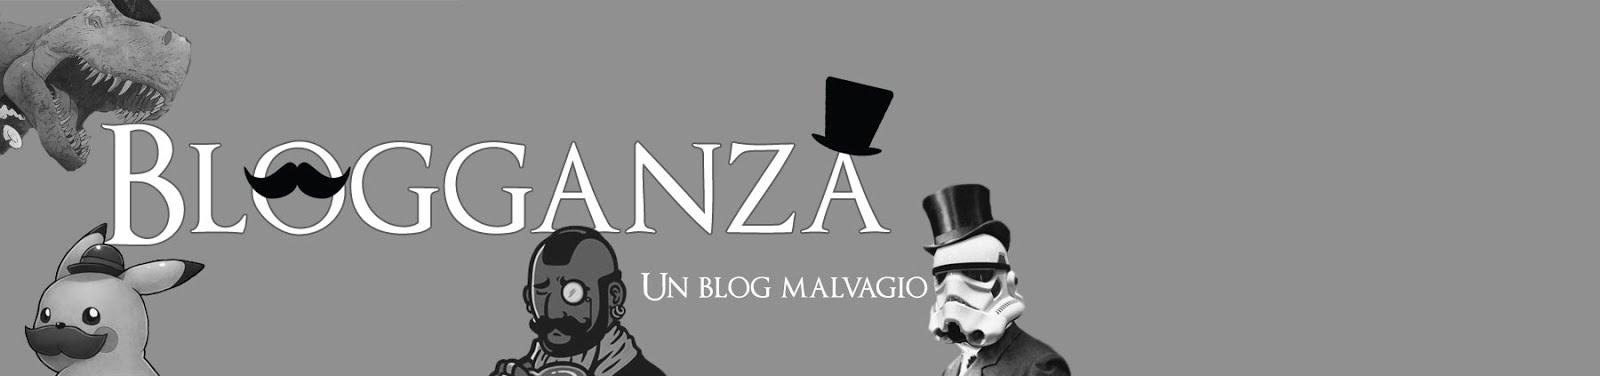 Blogganza